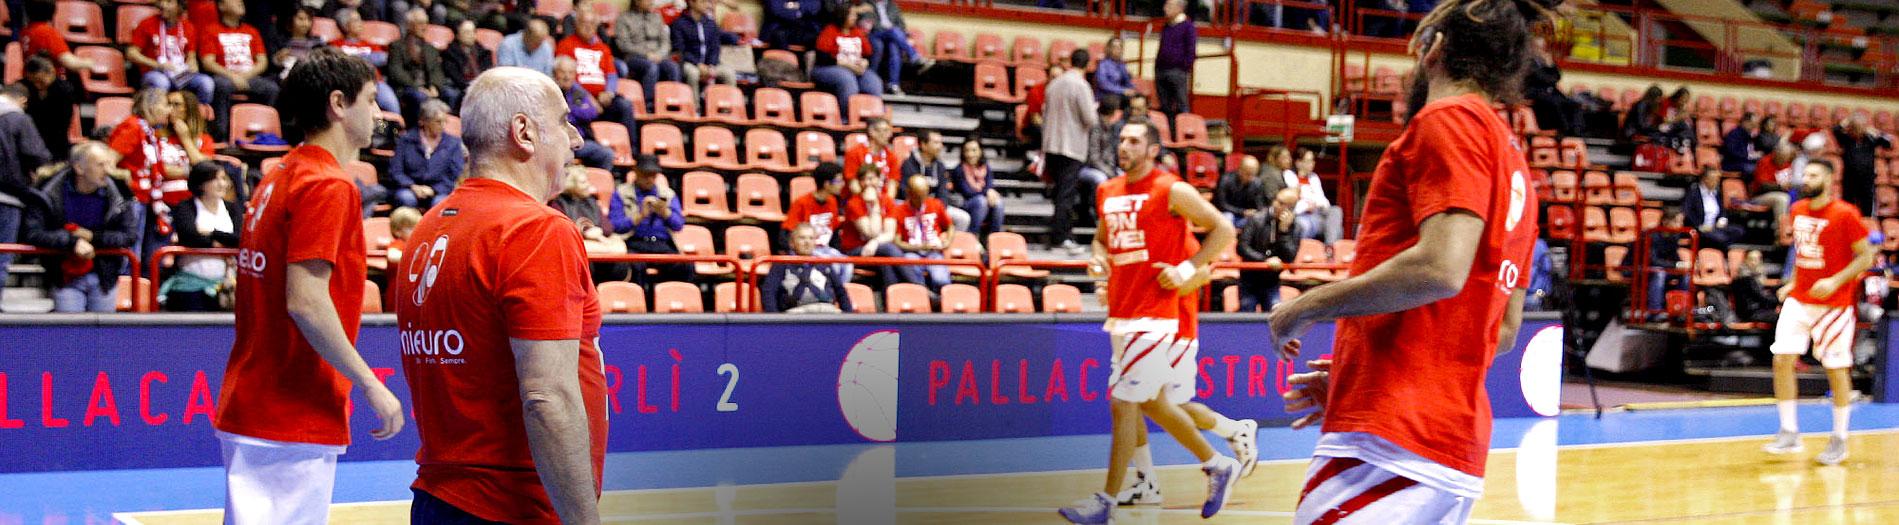 Allenamento squadra basket Unieuro